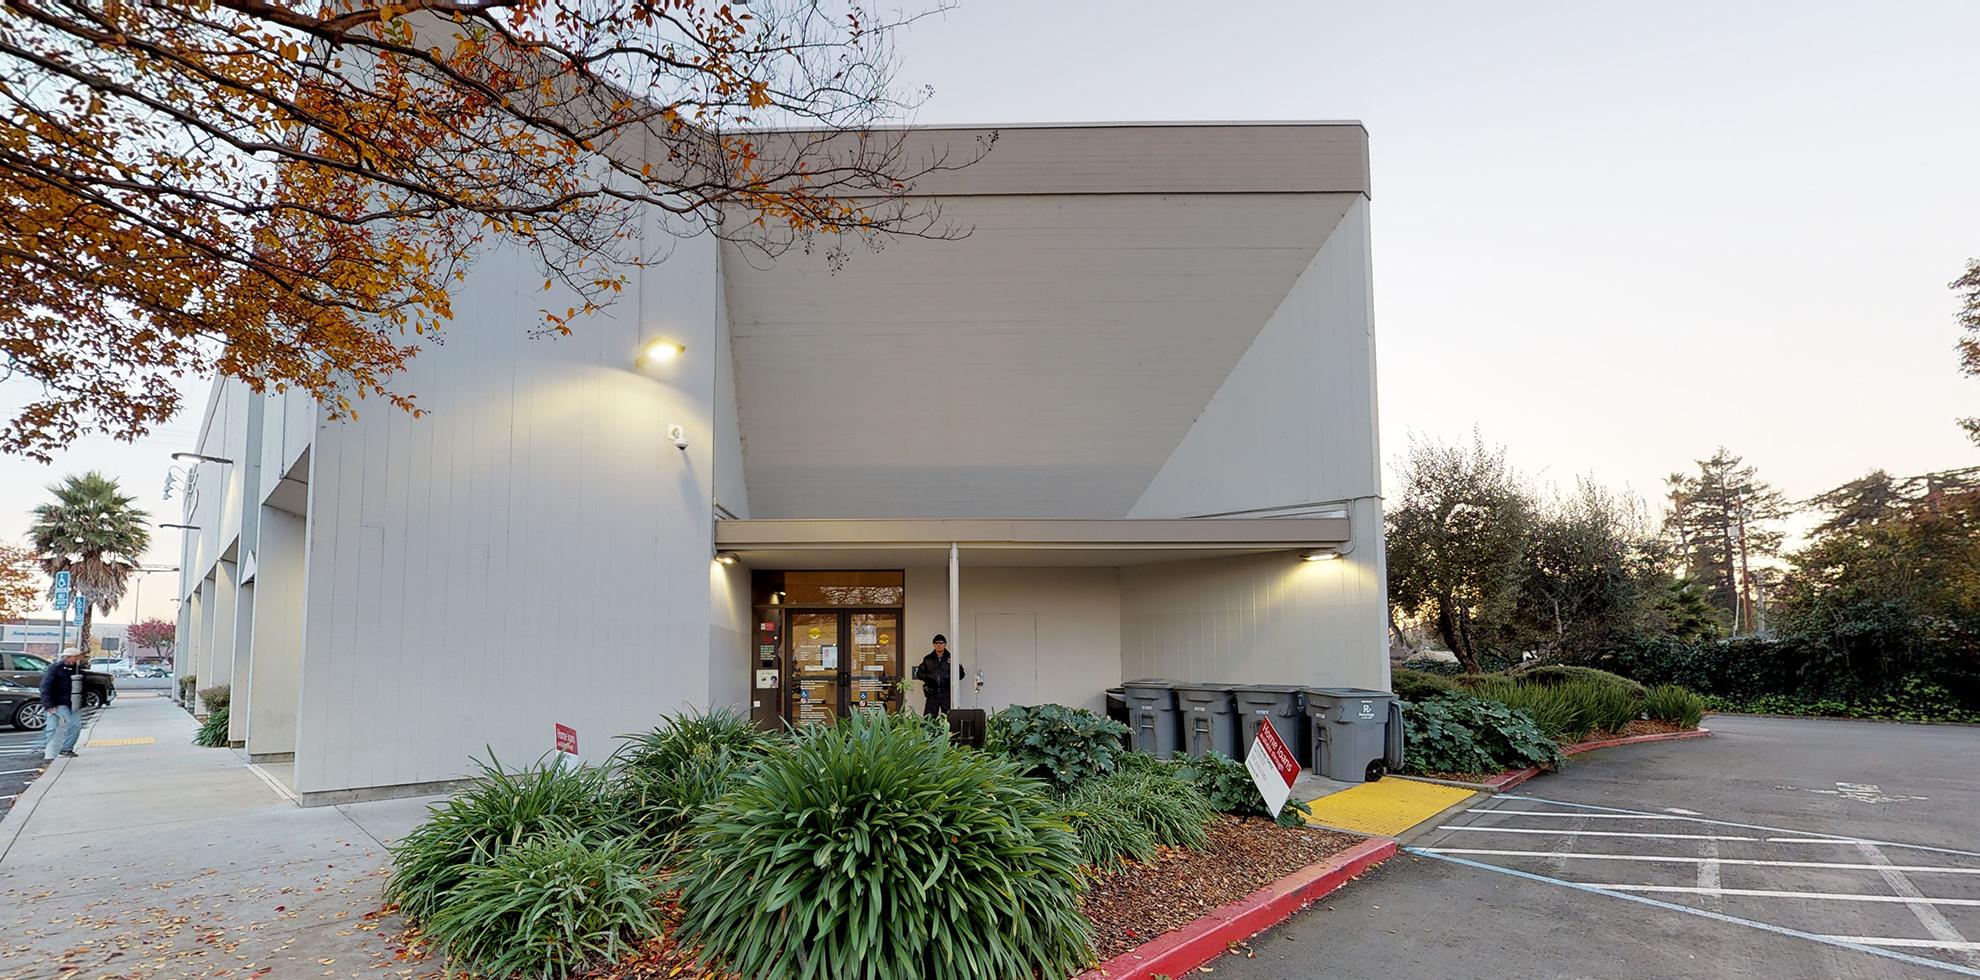 Bank of America financial center with drive-thru ATM   1155 W Steele Ln, Santa Rosa, CA 95403